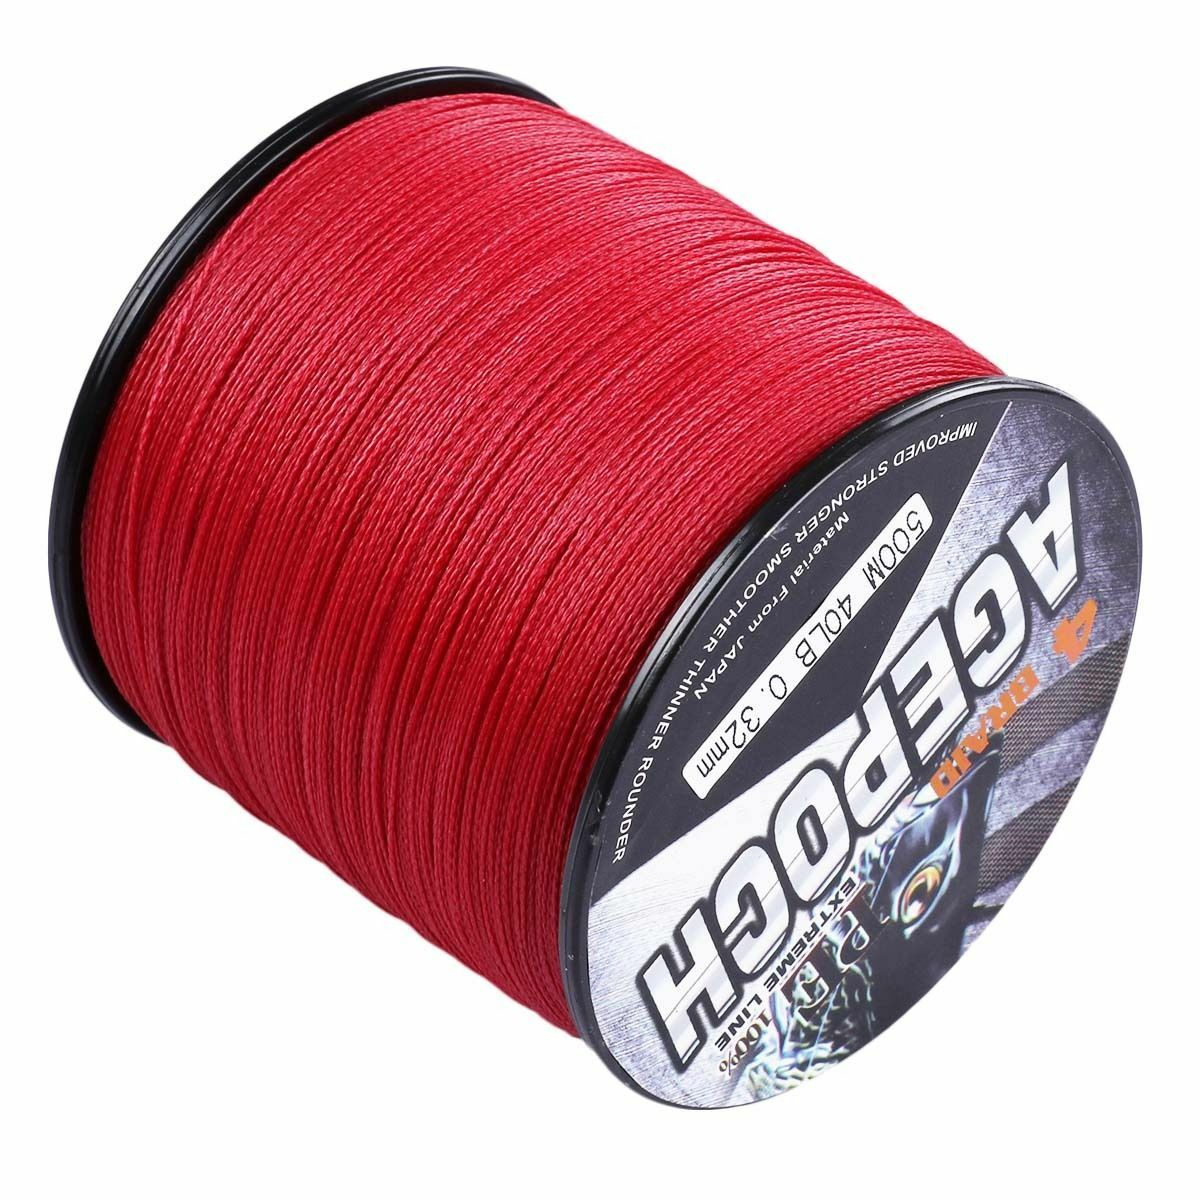 Red 109yds2187yds 100% pe Dyneema Braided Fishing Line 10LB-300LB Agepoch